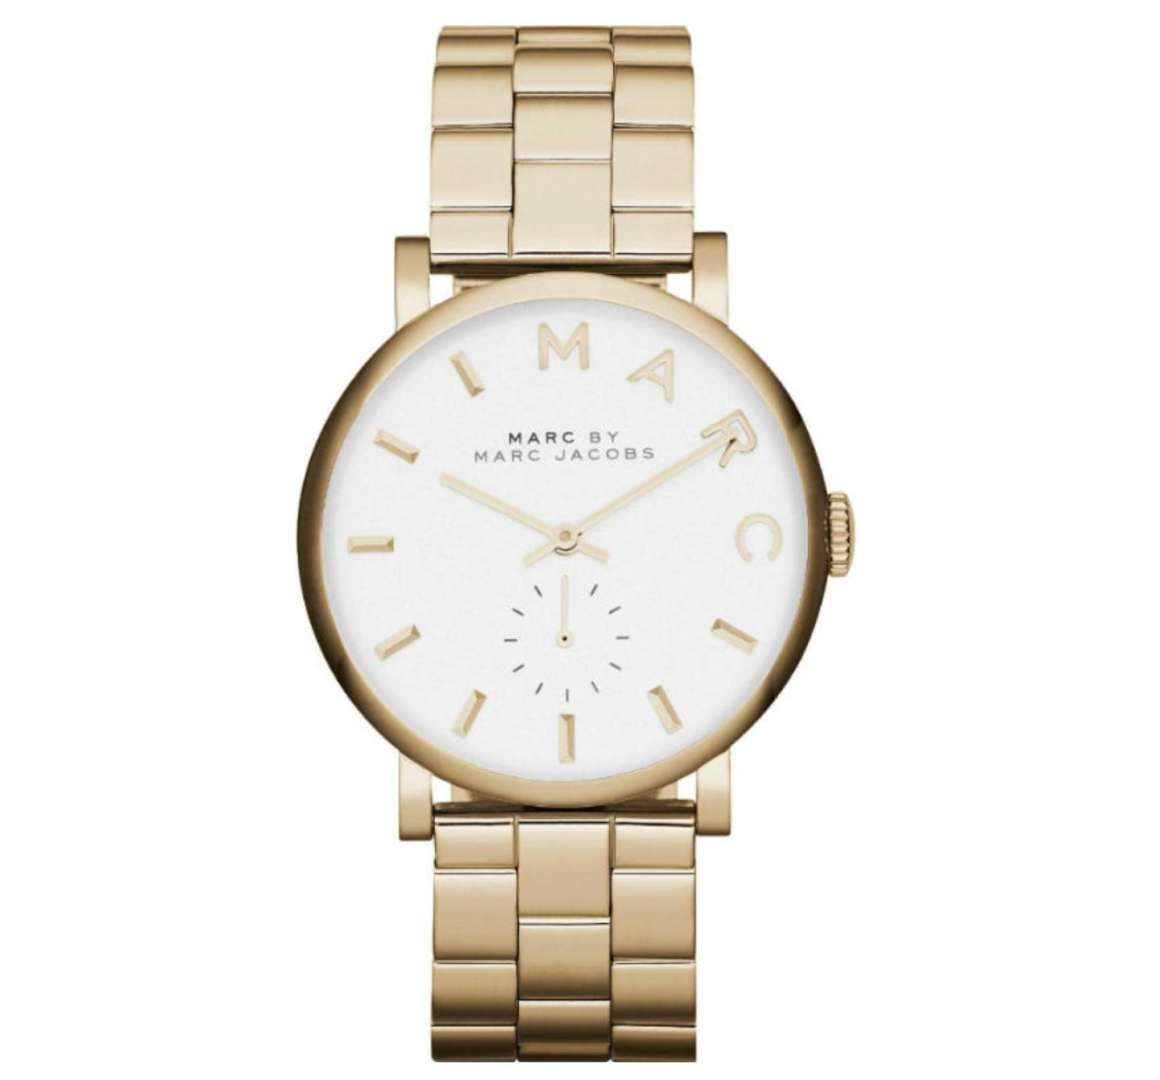 שעון יד אנלוגי mark jacobs דגם: mbm3243 מארק ג'ייקובס